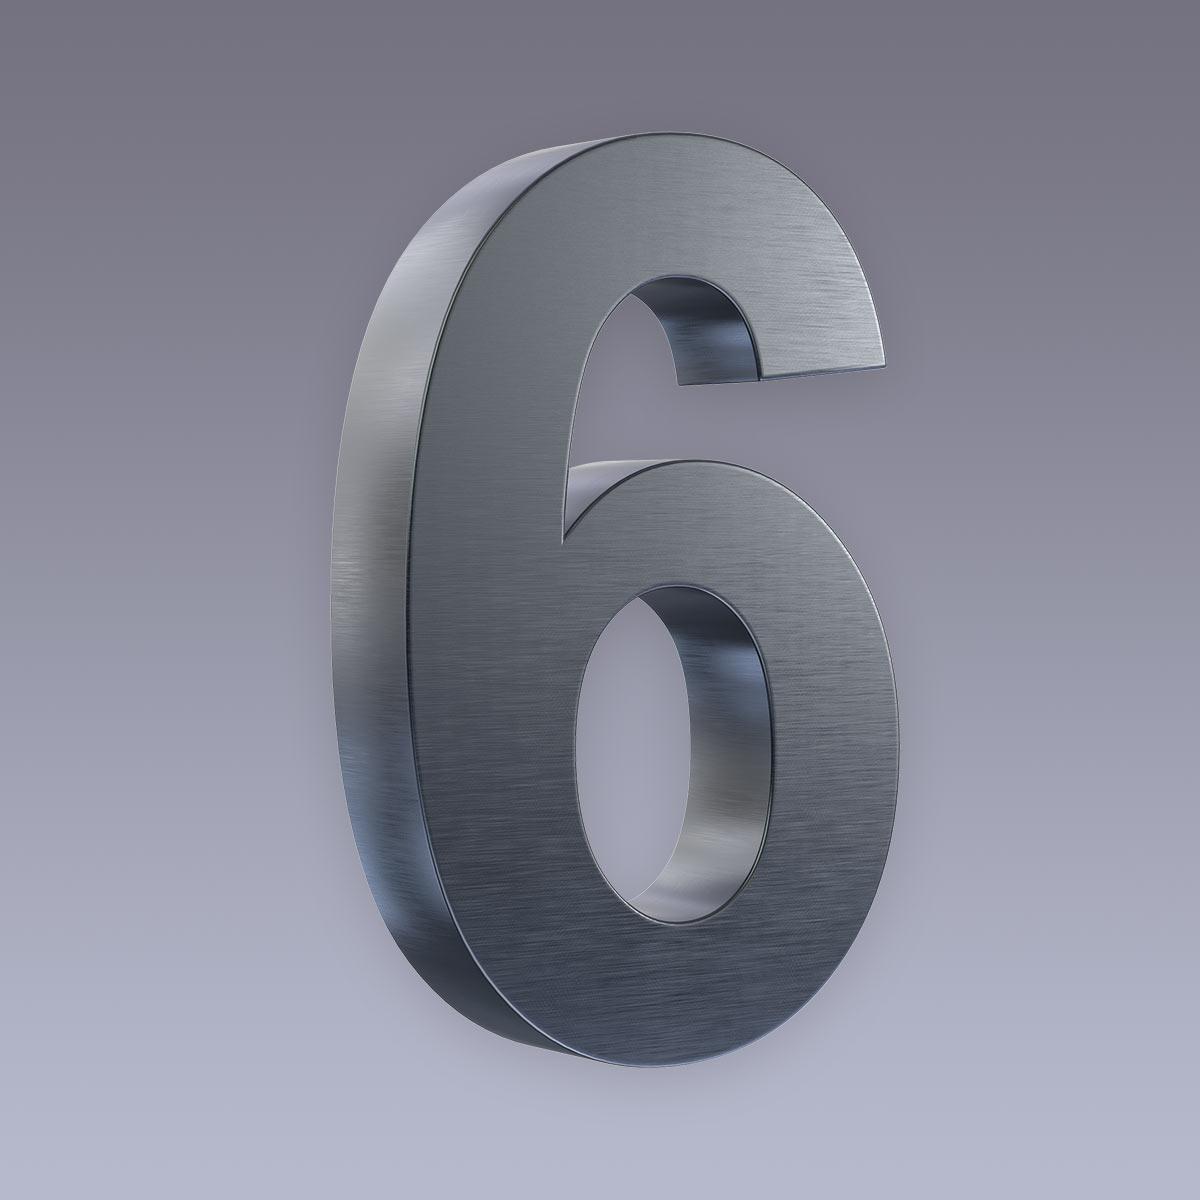 3D Hausnummer 6 Edelstahl anthrazit RAL7016 in 3D Design Arial